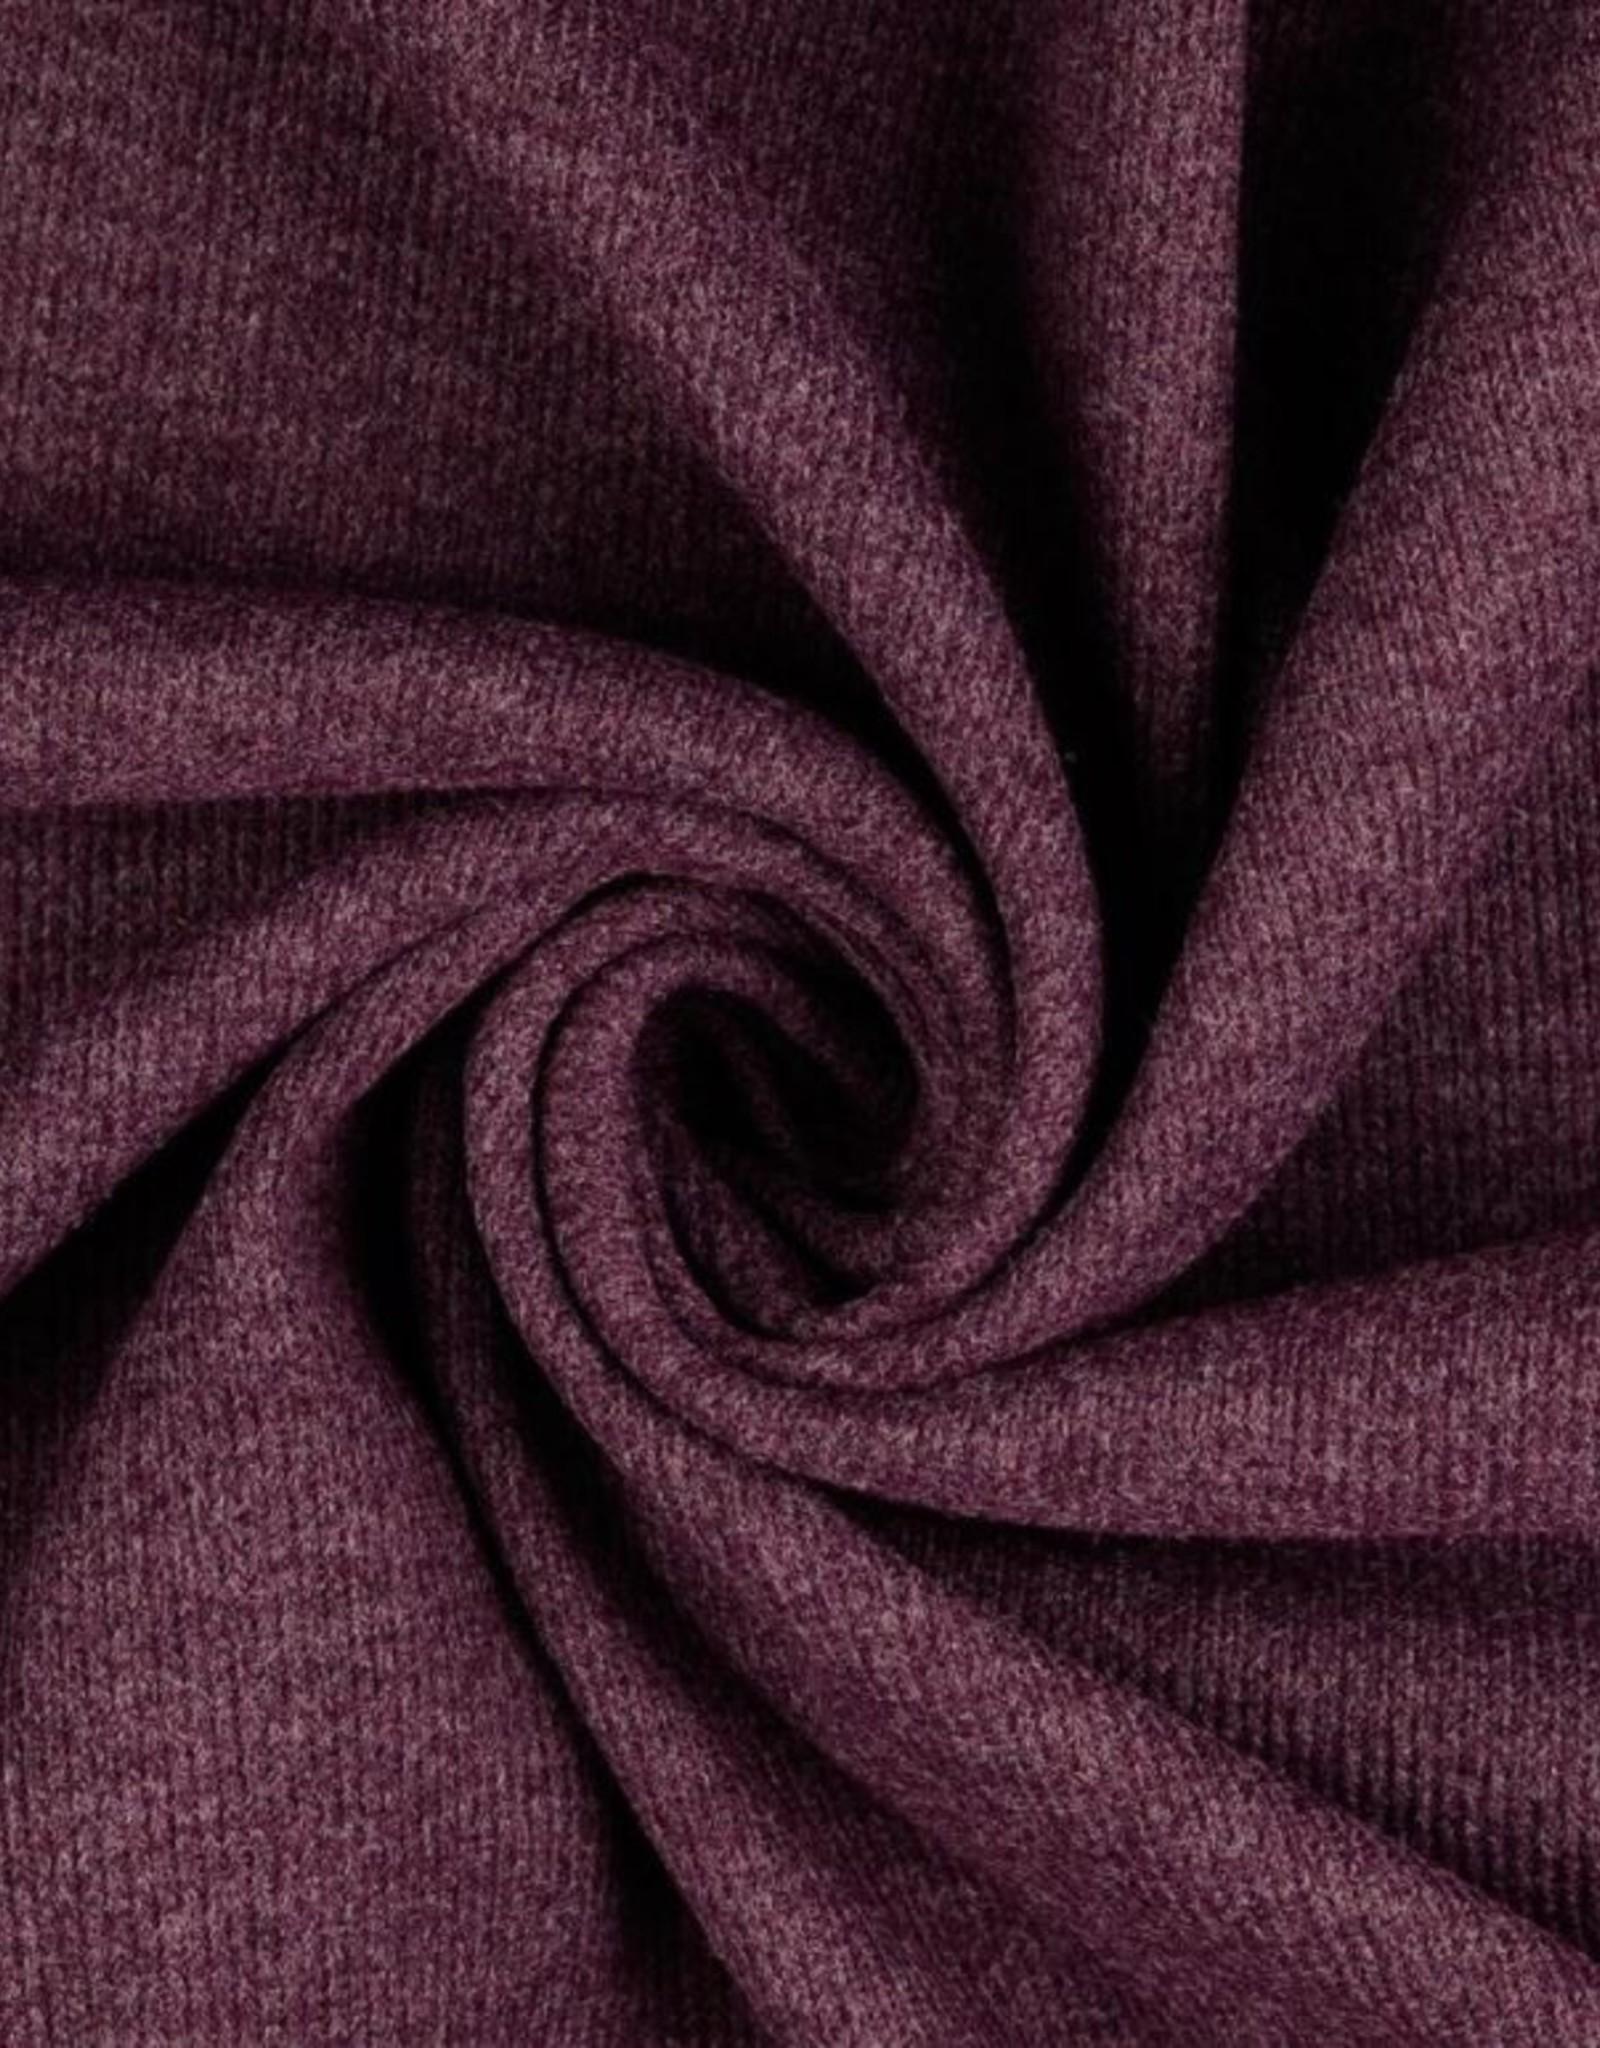 Gebreide stof donker rood bordeaux gemengd